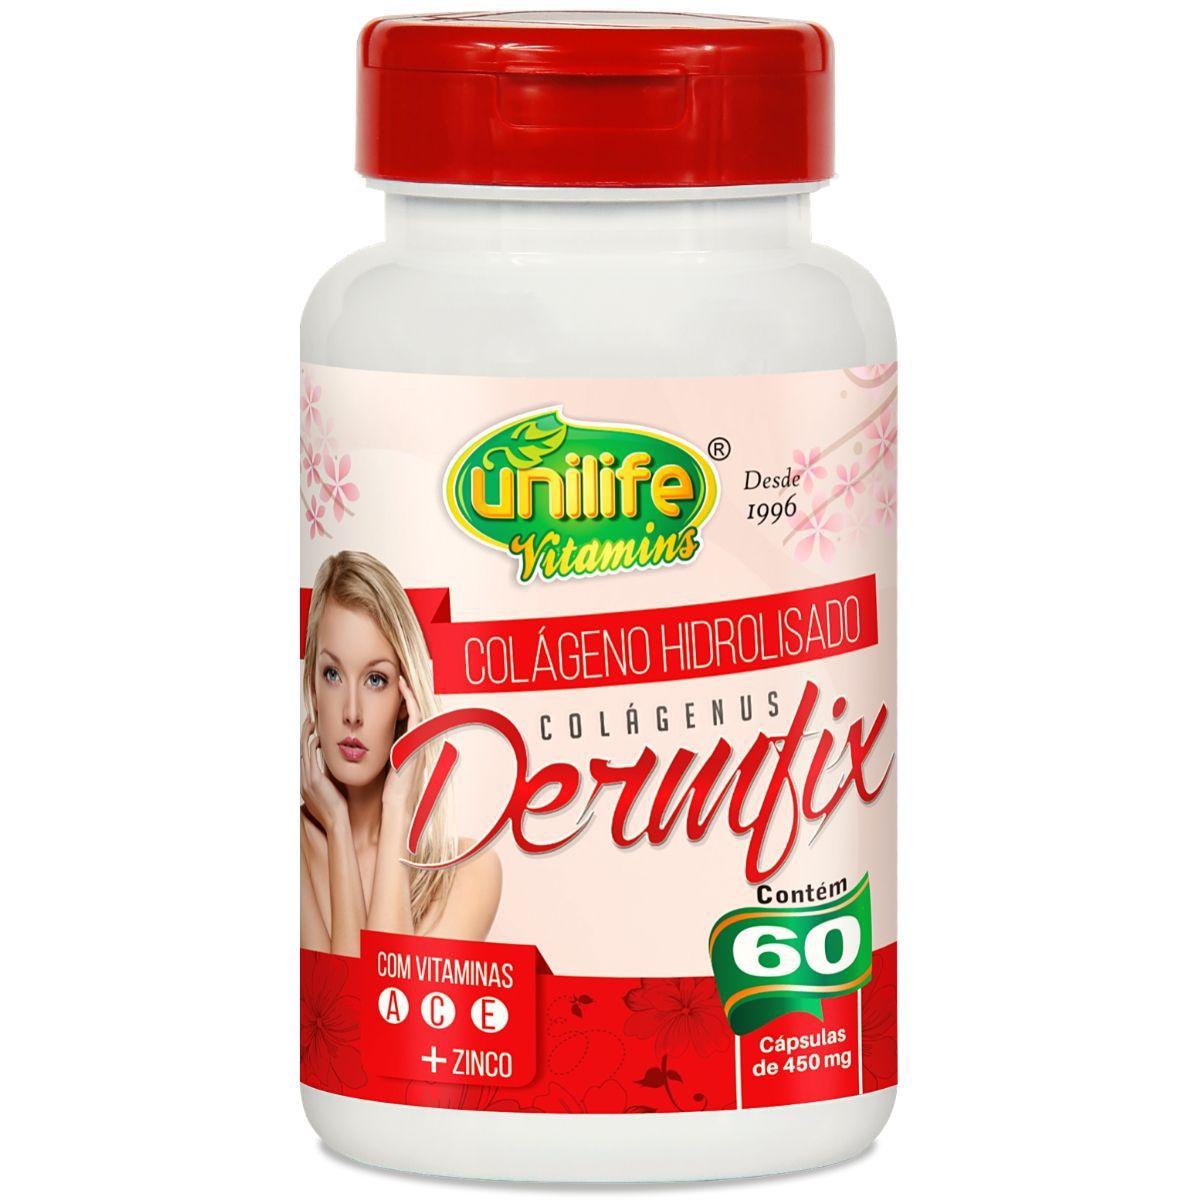 Colageno Hidrolisado Dermfix C/ Vitaminas 60 Cápsulas 450mg - Unilife